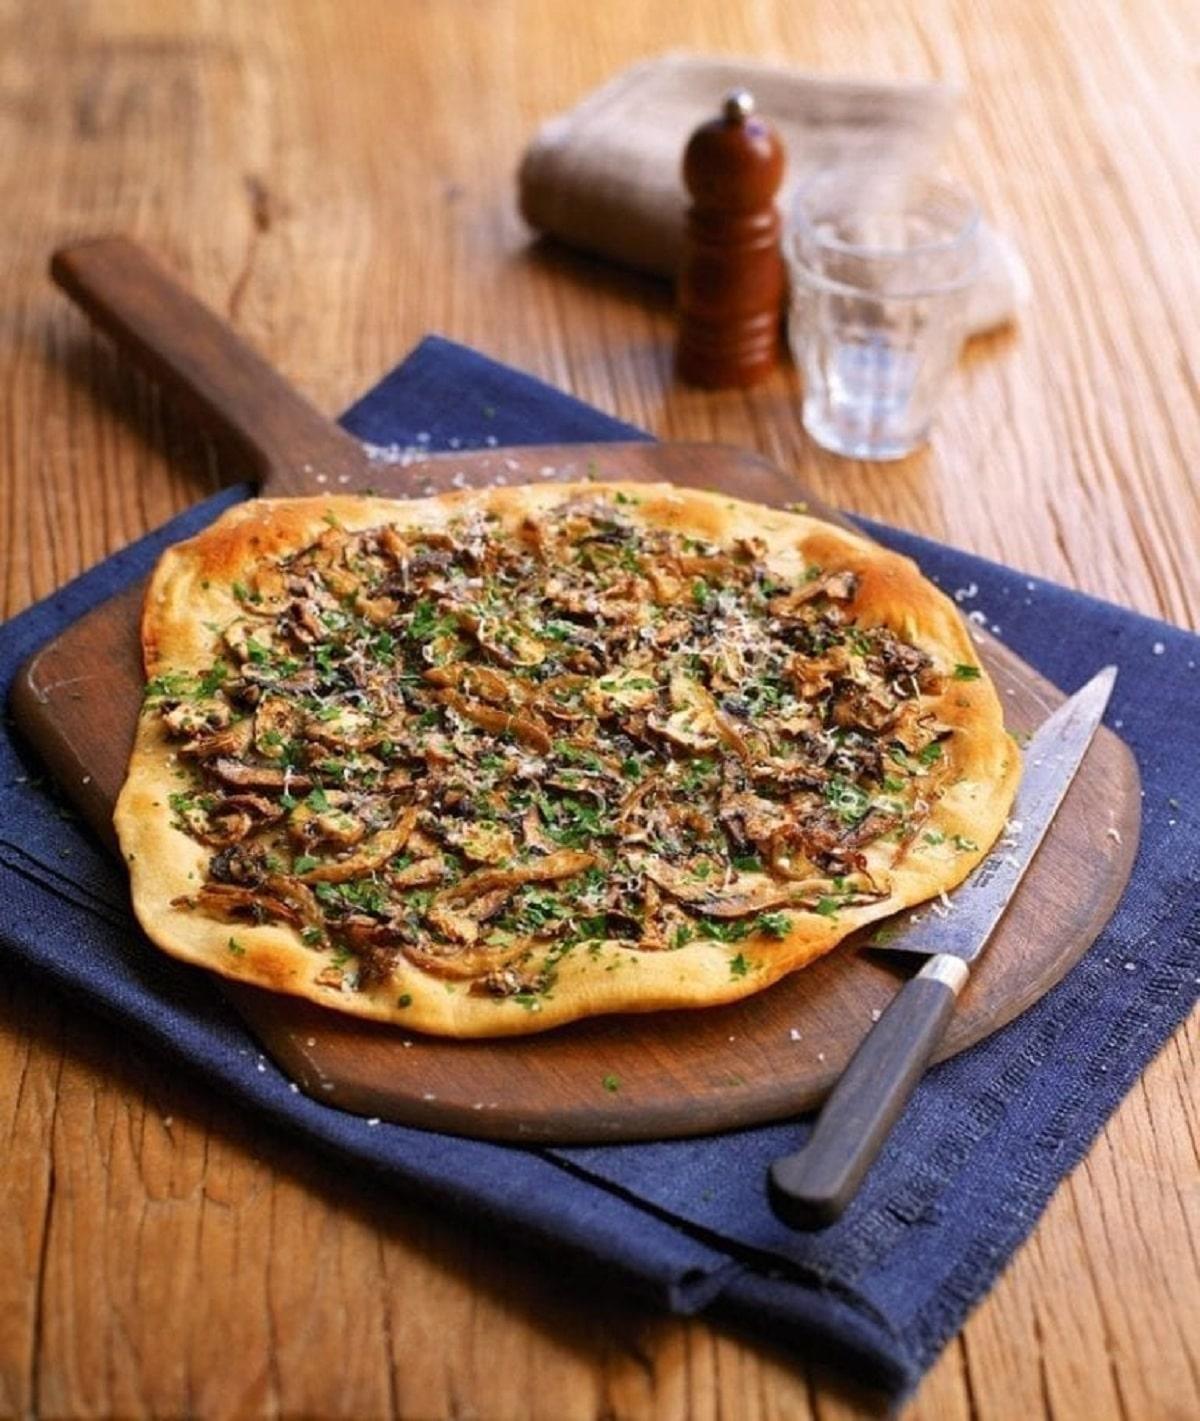 Truffle mushroom pizza on a pizza board